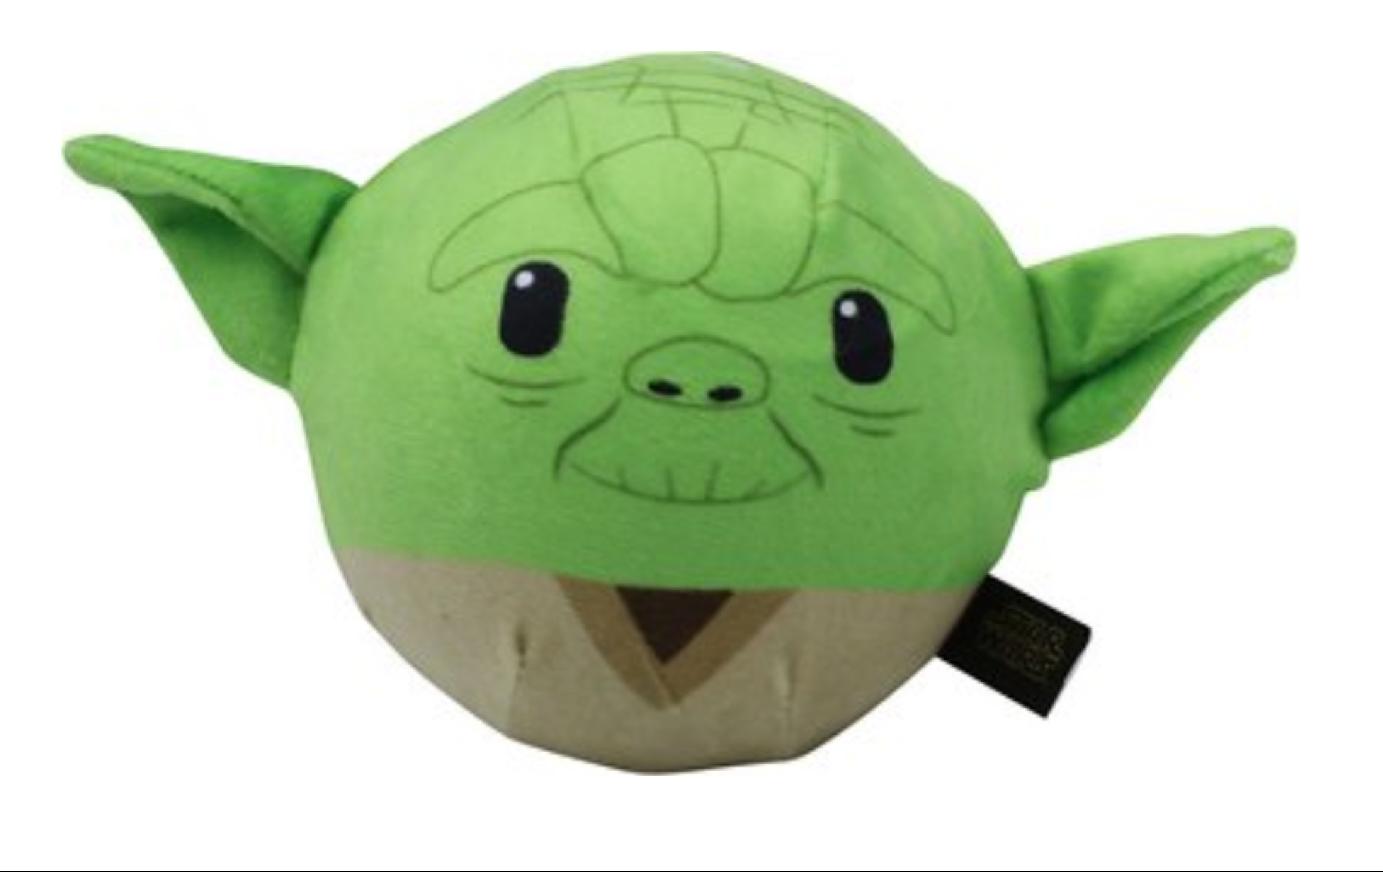 star wars yoda pet toy